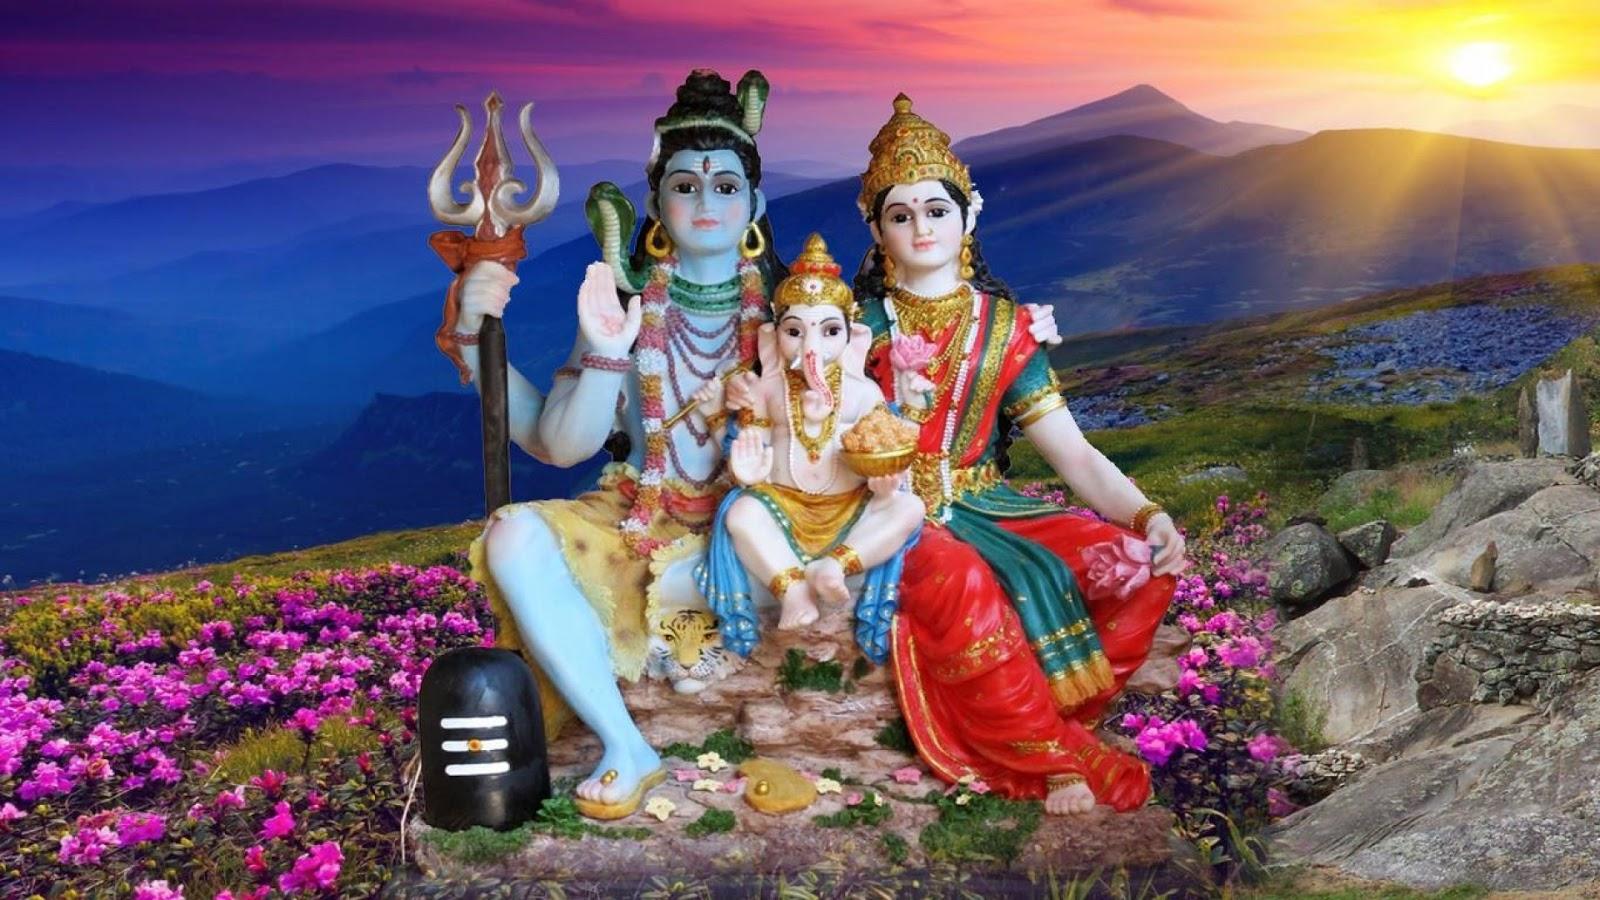 Most Inspiring Wallpaper High Quality Shiva - Shiva%2B1  Image_344022.jpg